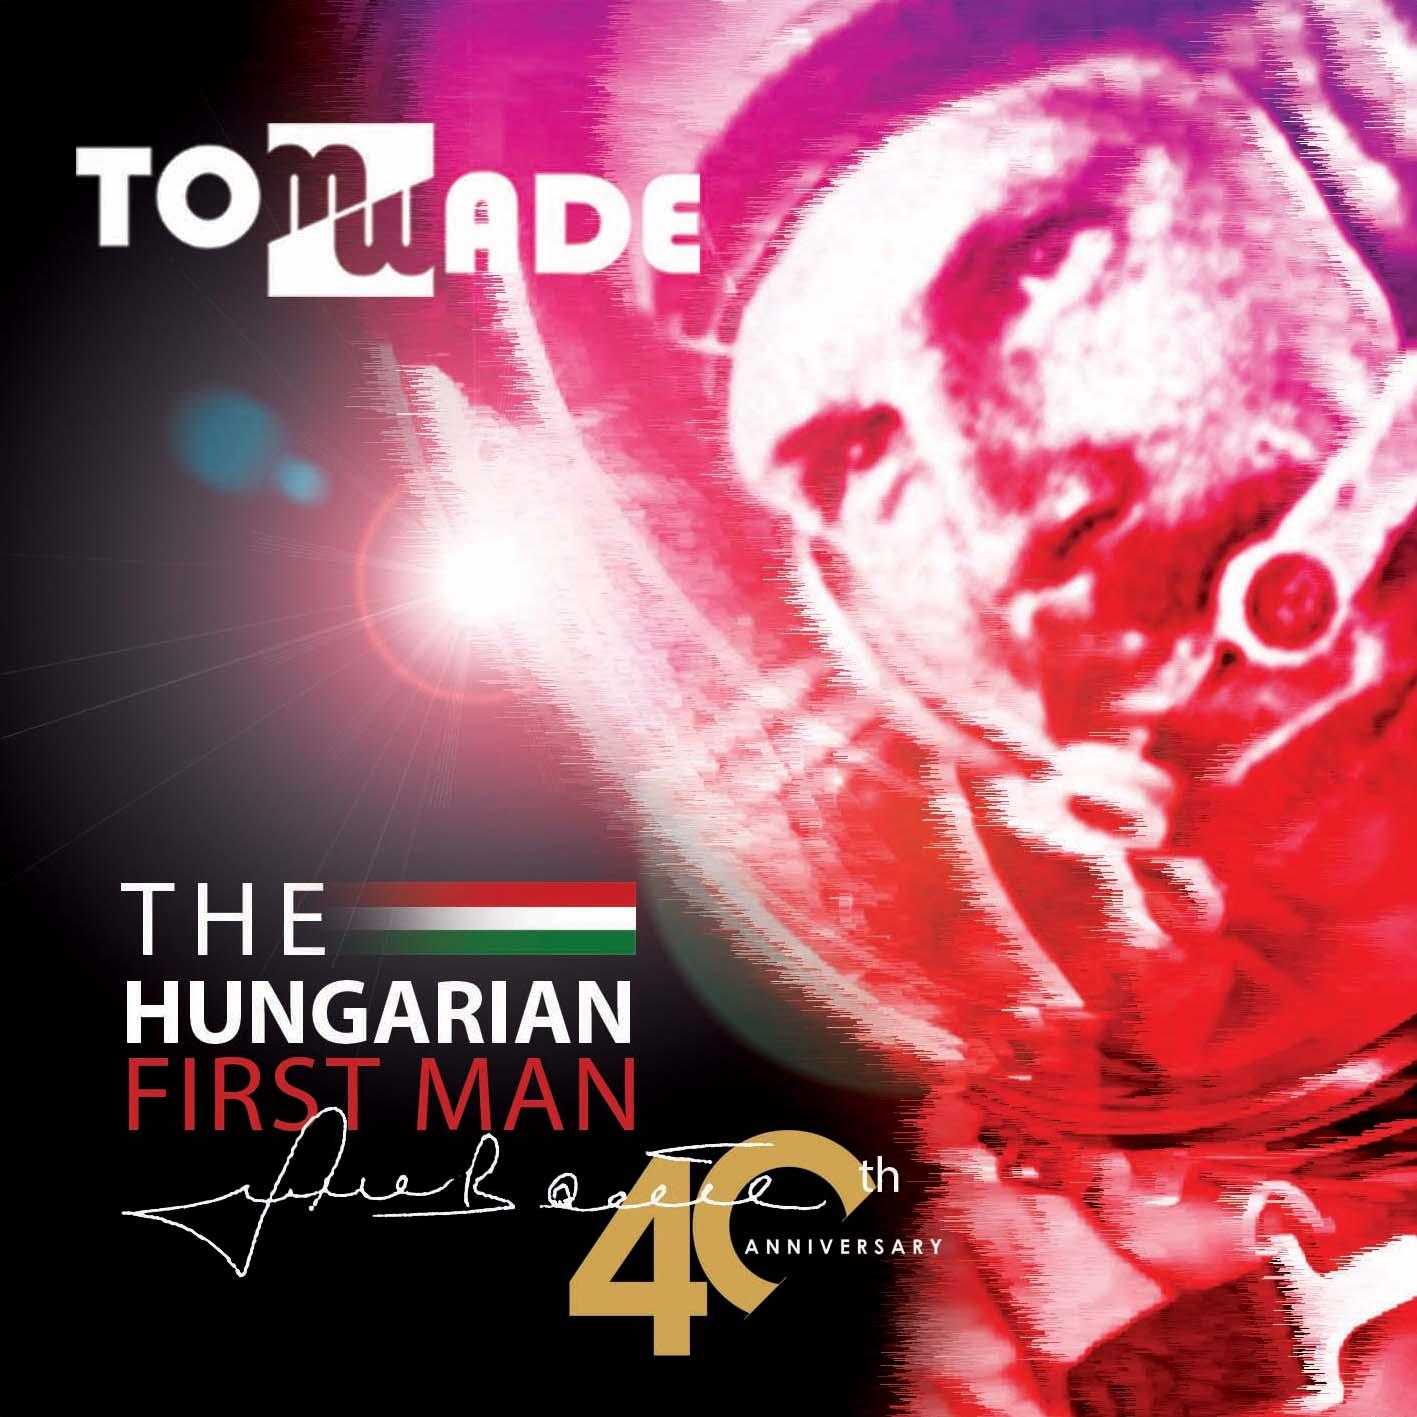 edf66_the_hungarian_first_man